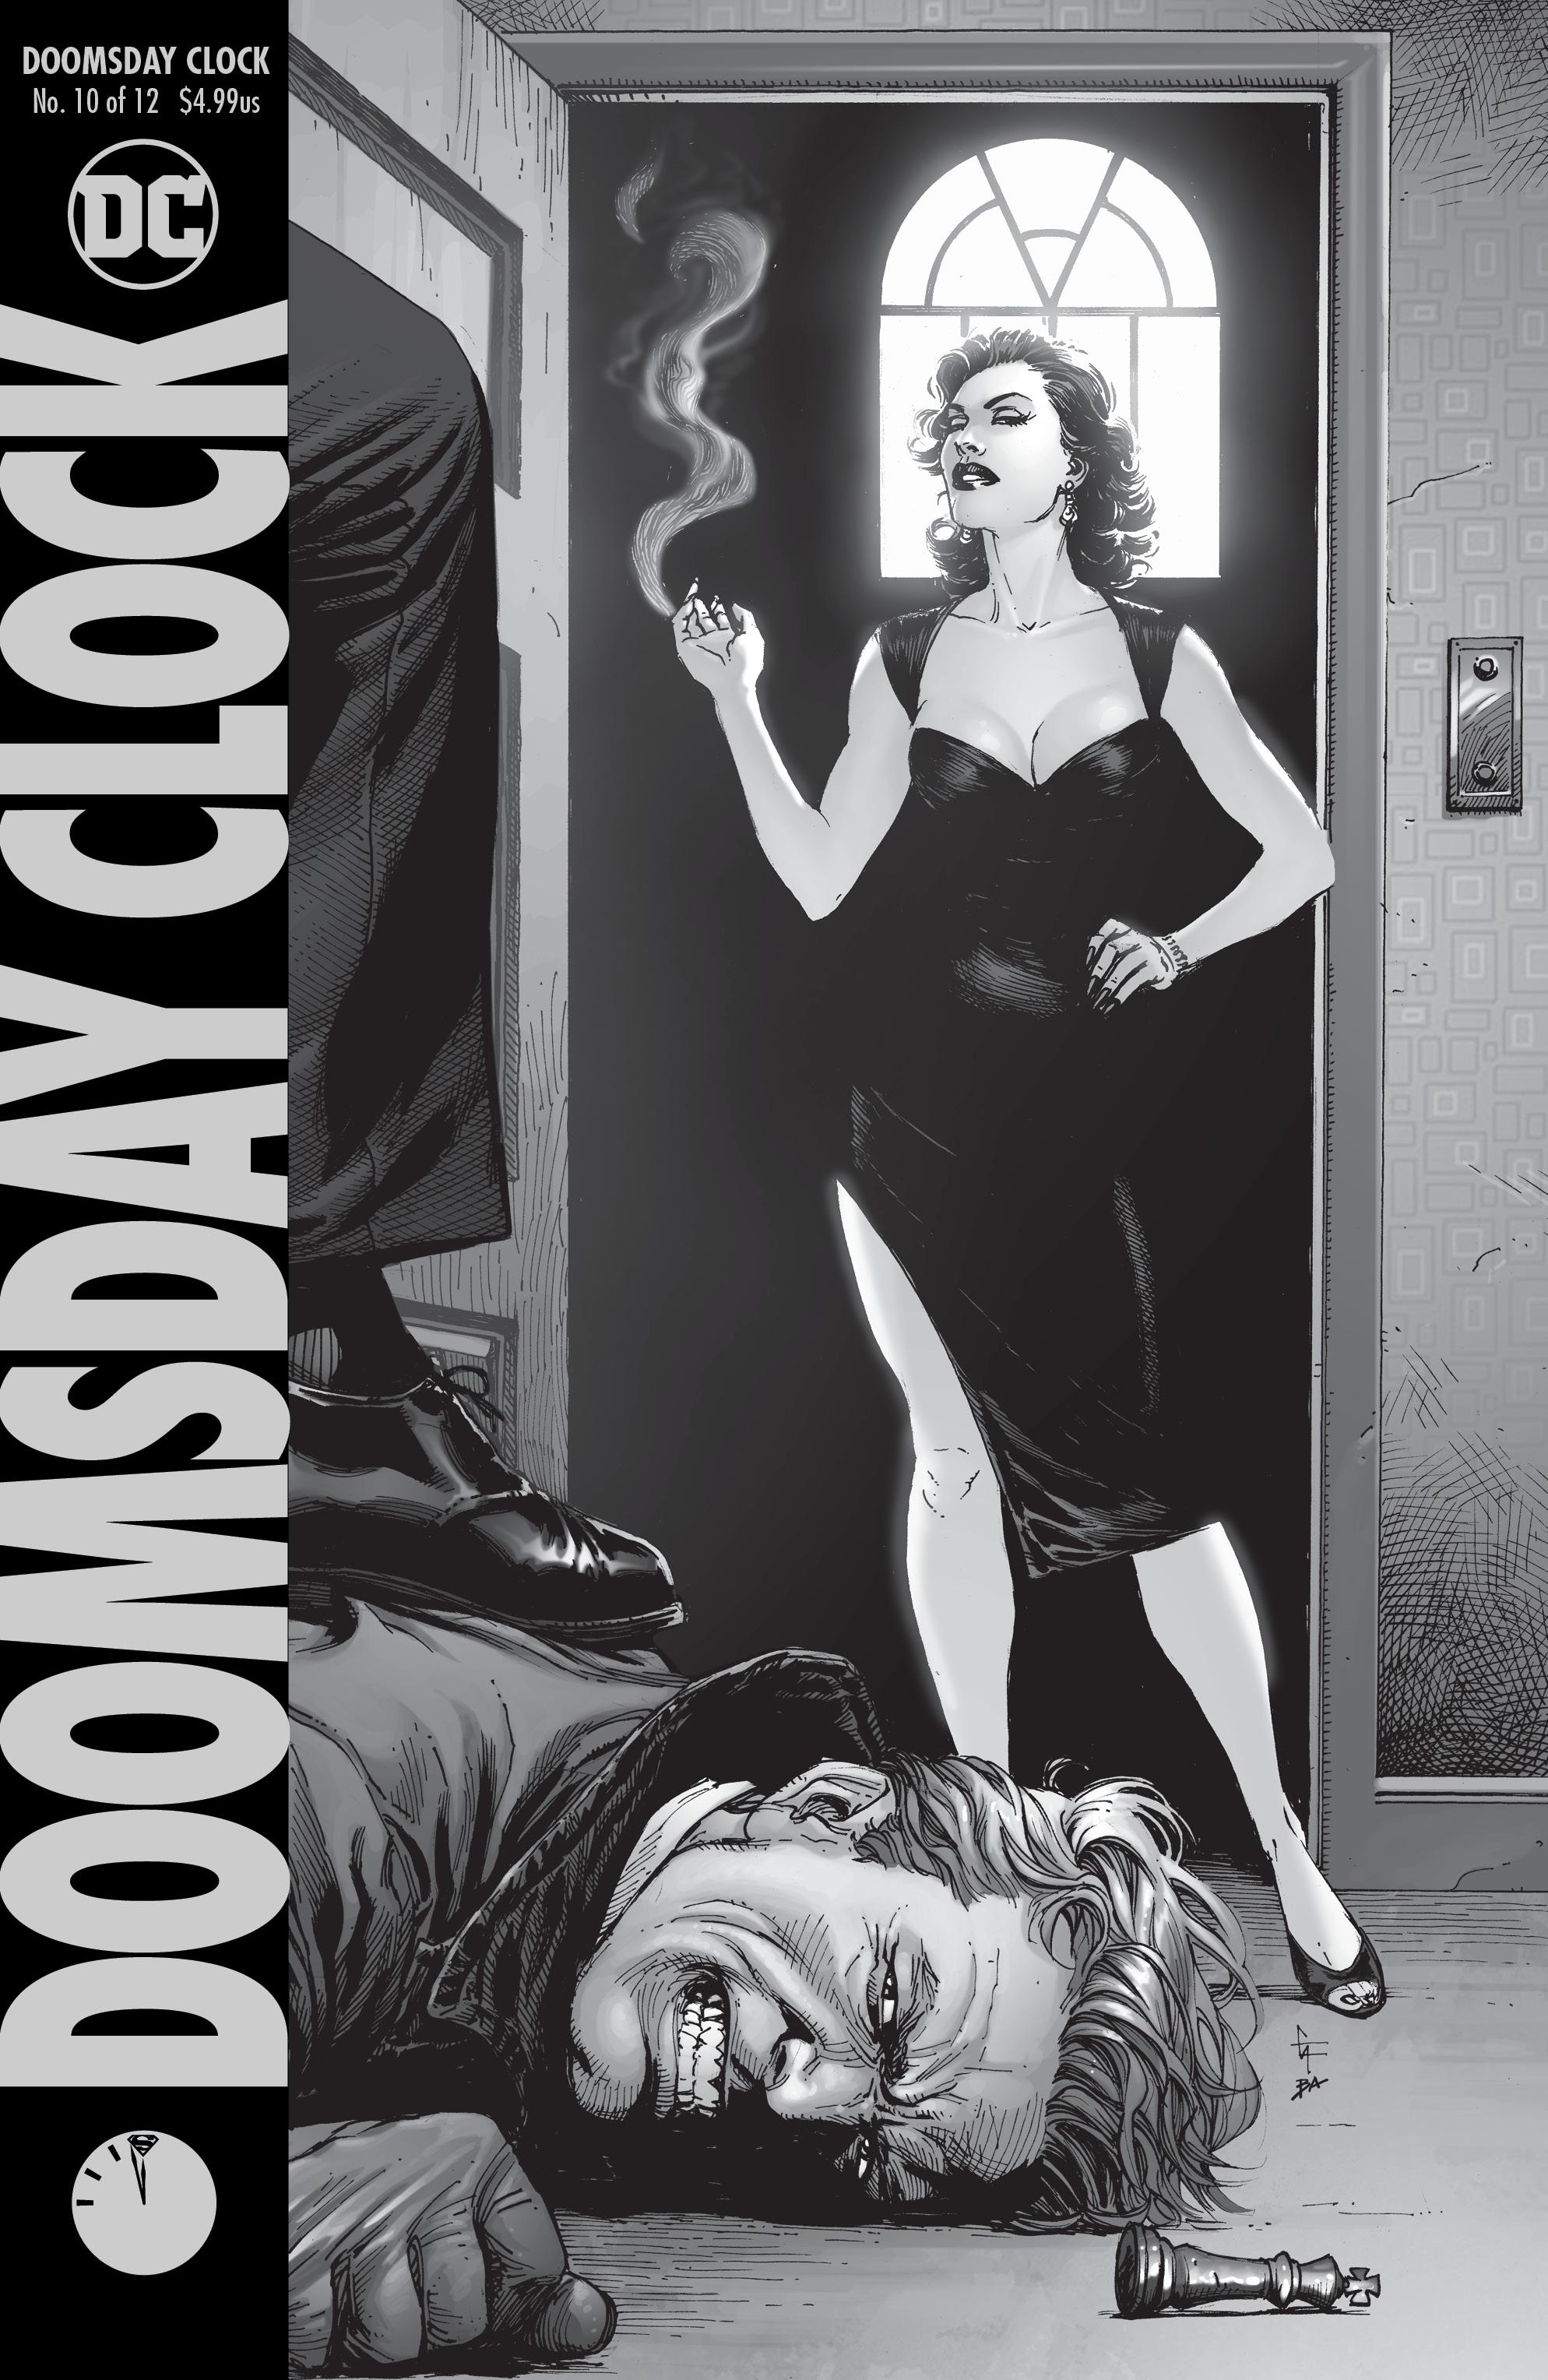 Doomsday Clock #10